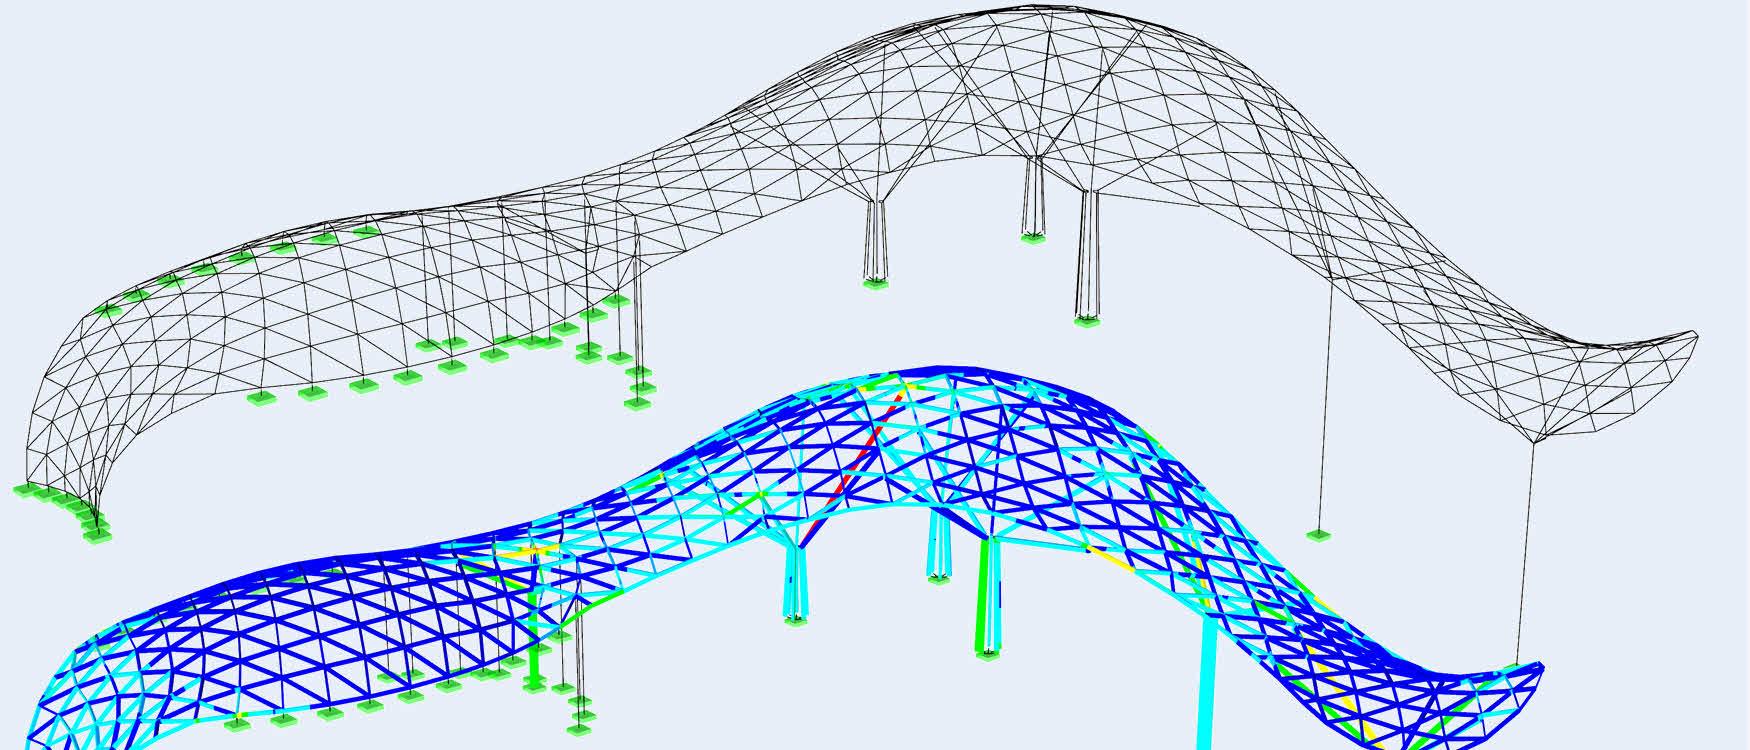 Shanghai Center model in rekensoftware RFEM (C)www.novumstructures